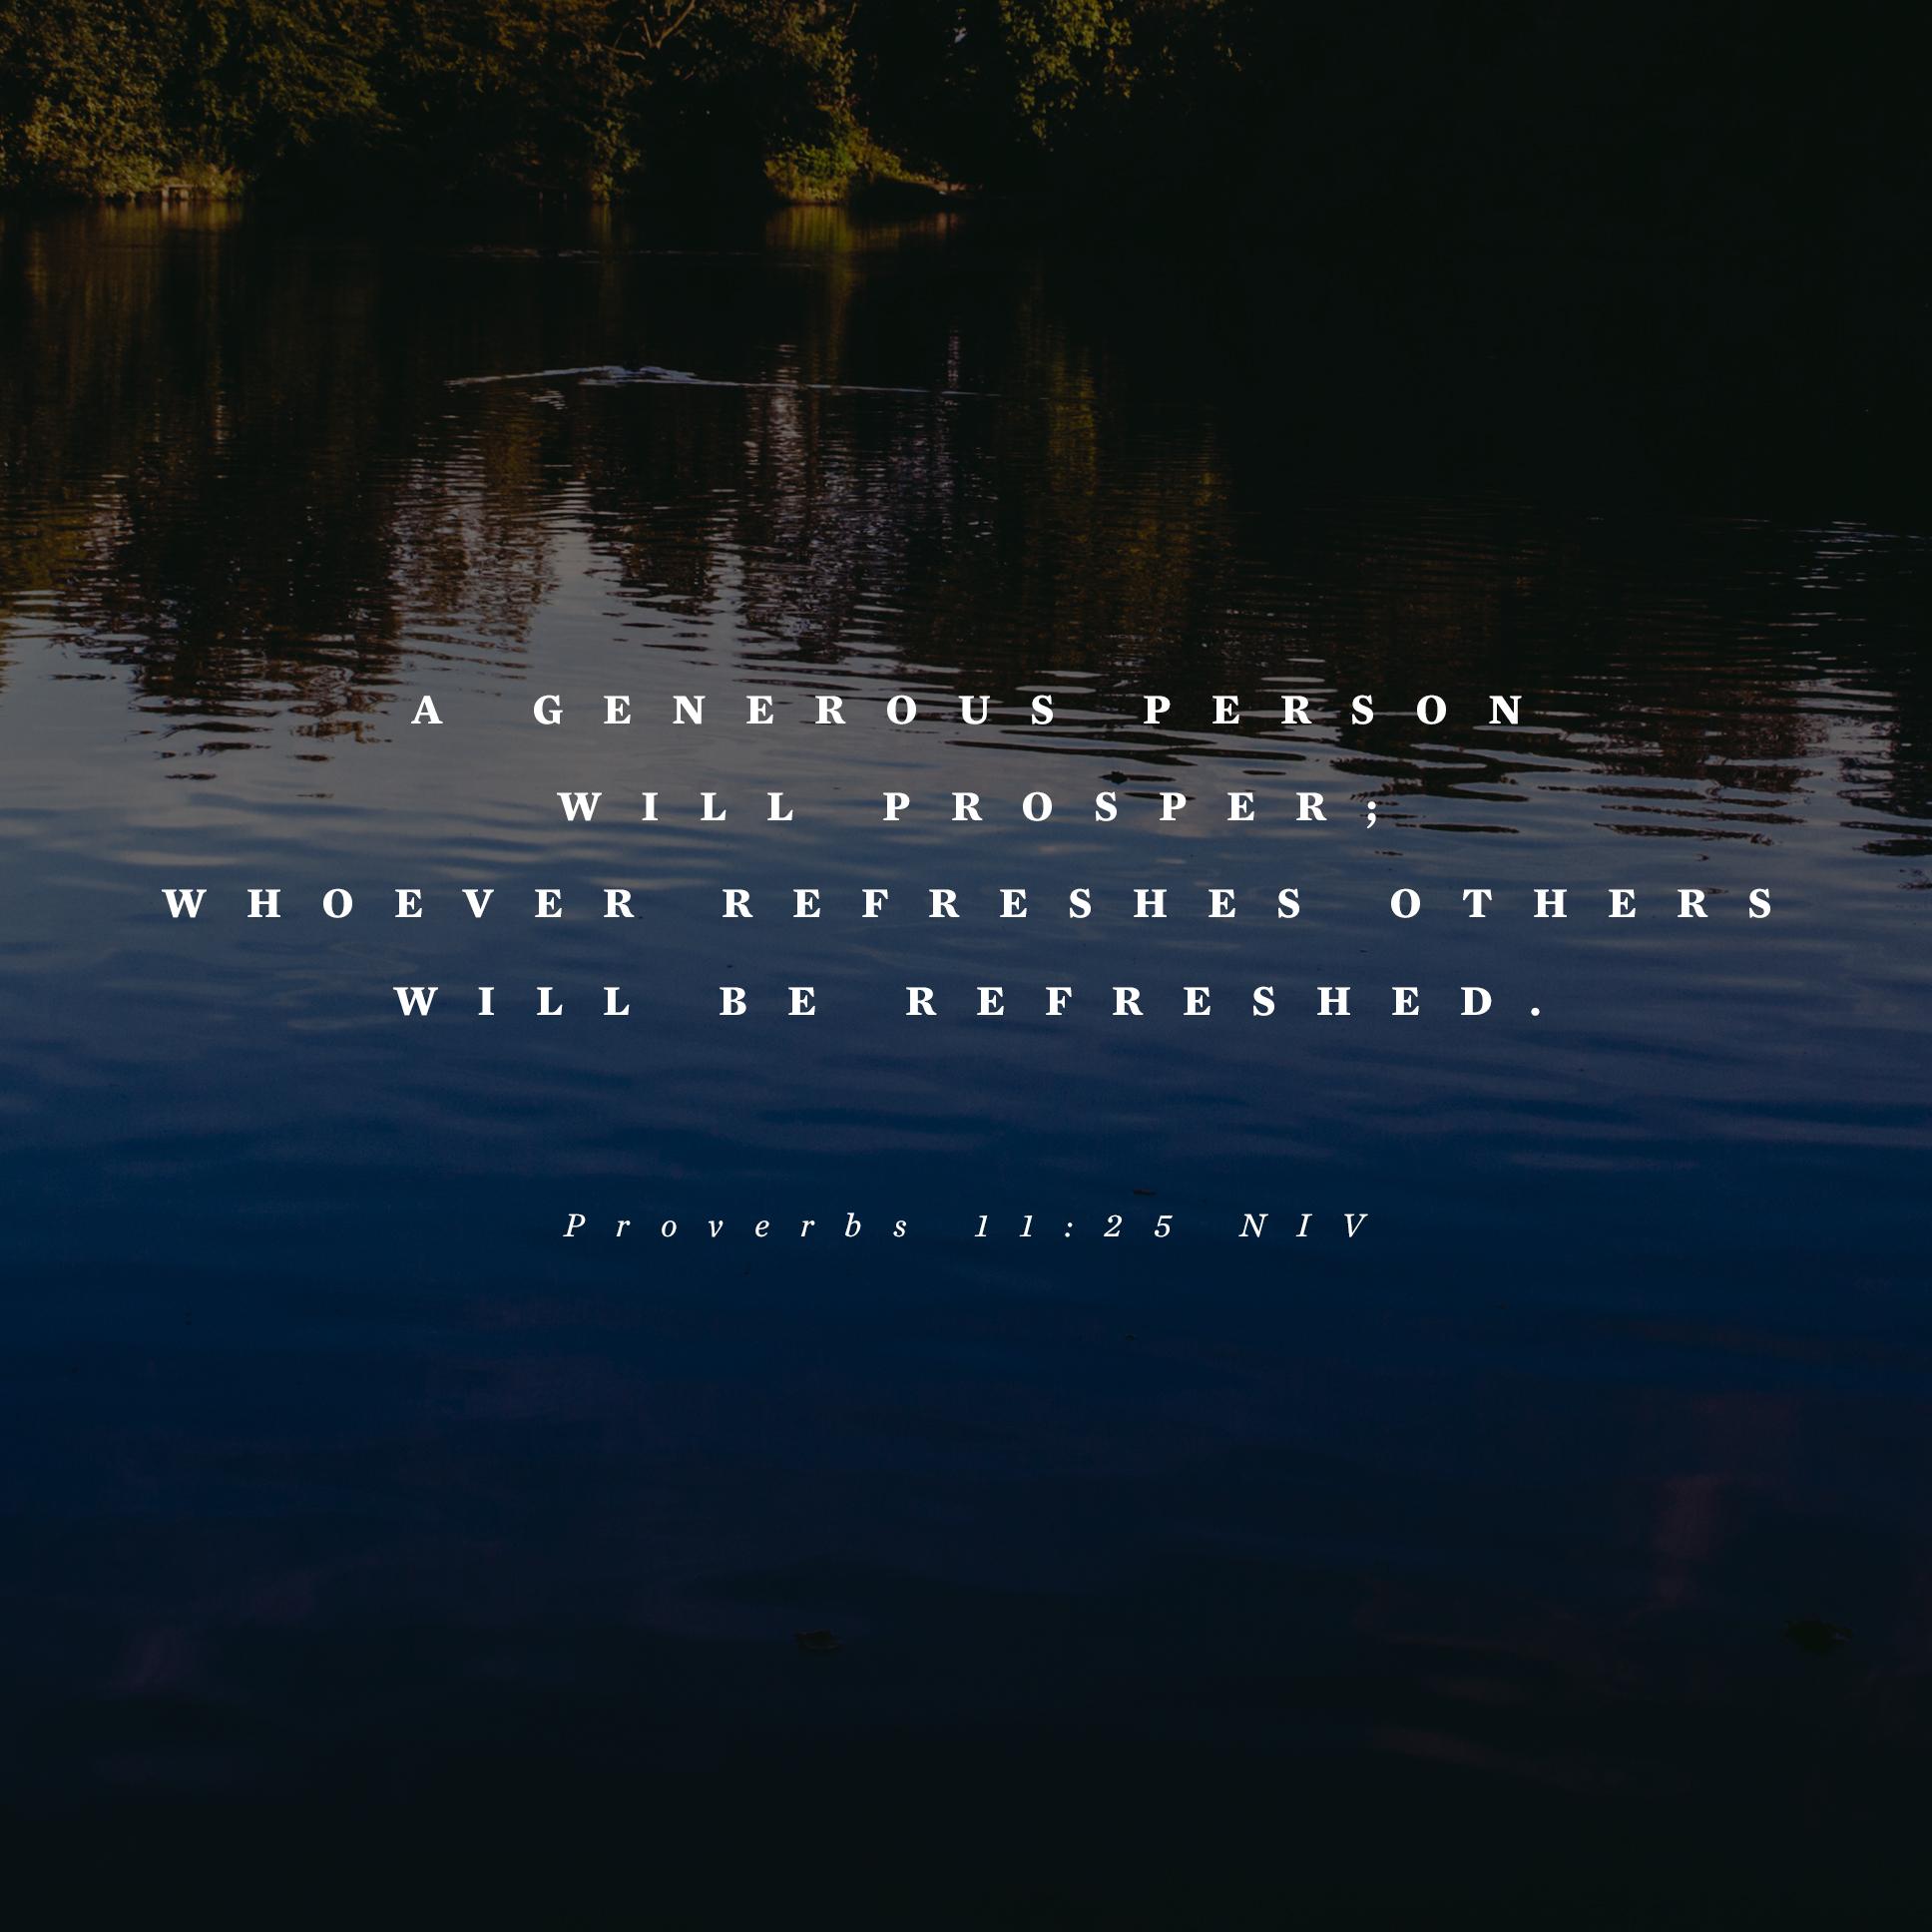 Proverbs 11:25 NIV